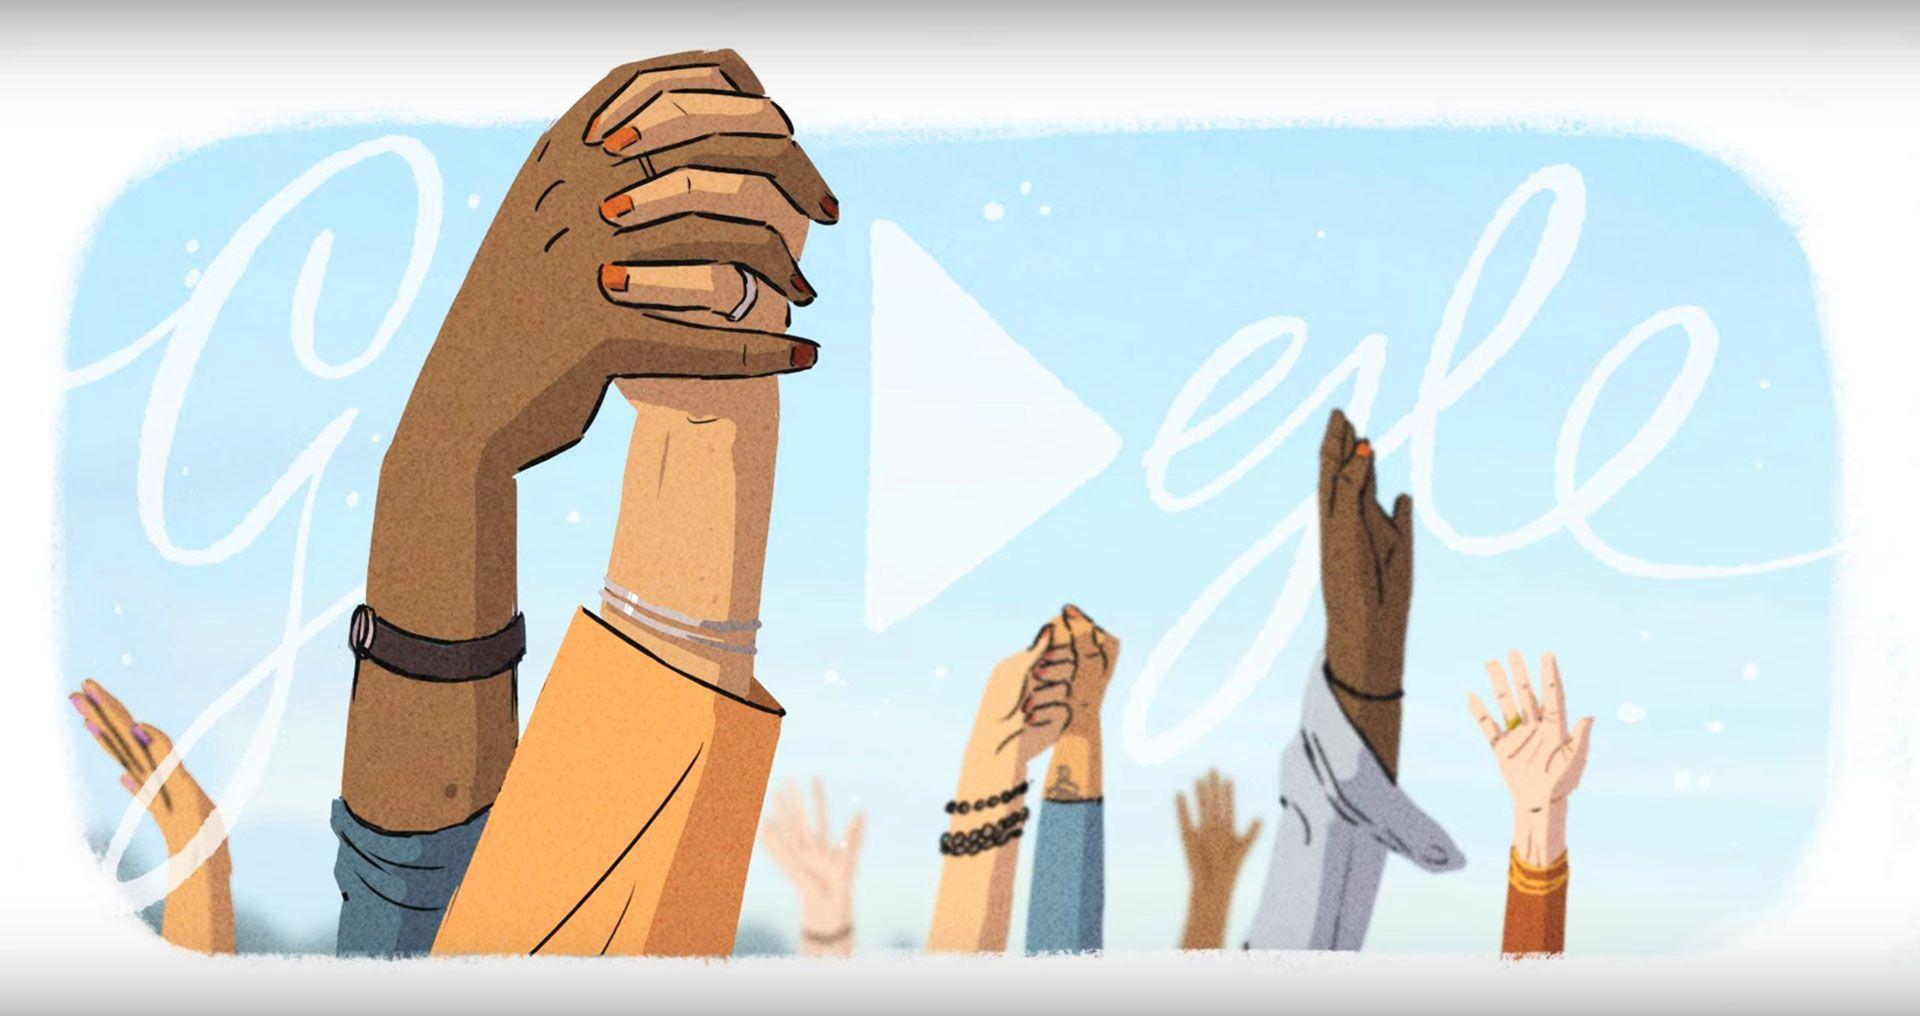 International Women's Day 2021: Google Doodle Honours Women's Accomplishments Throughout History